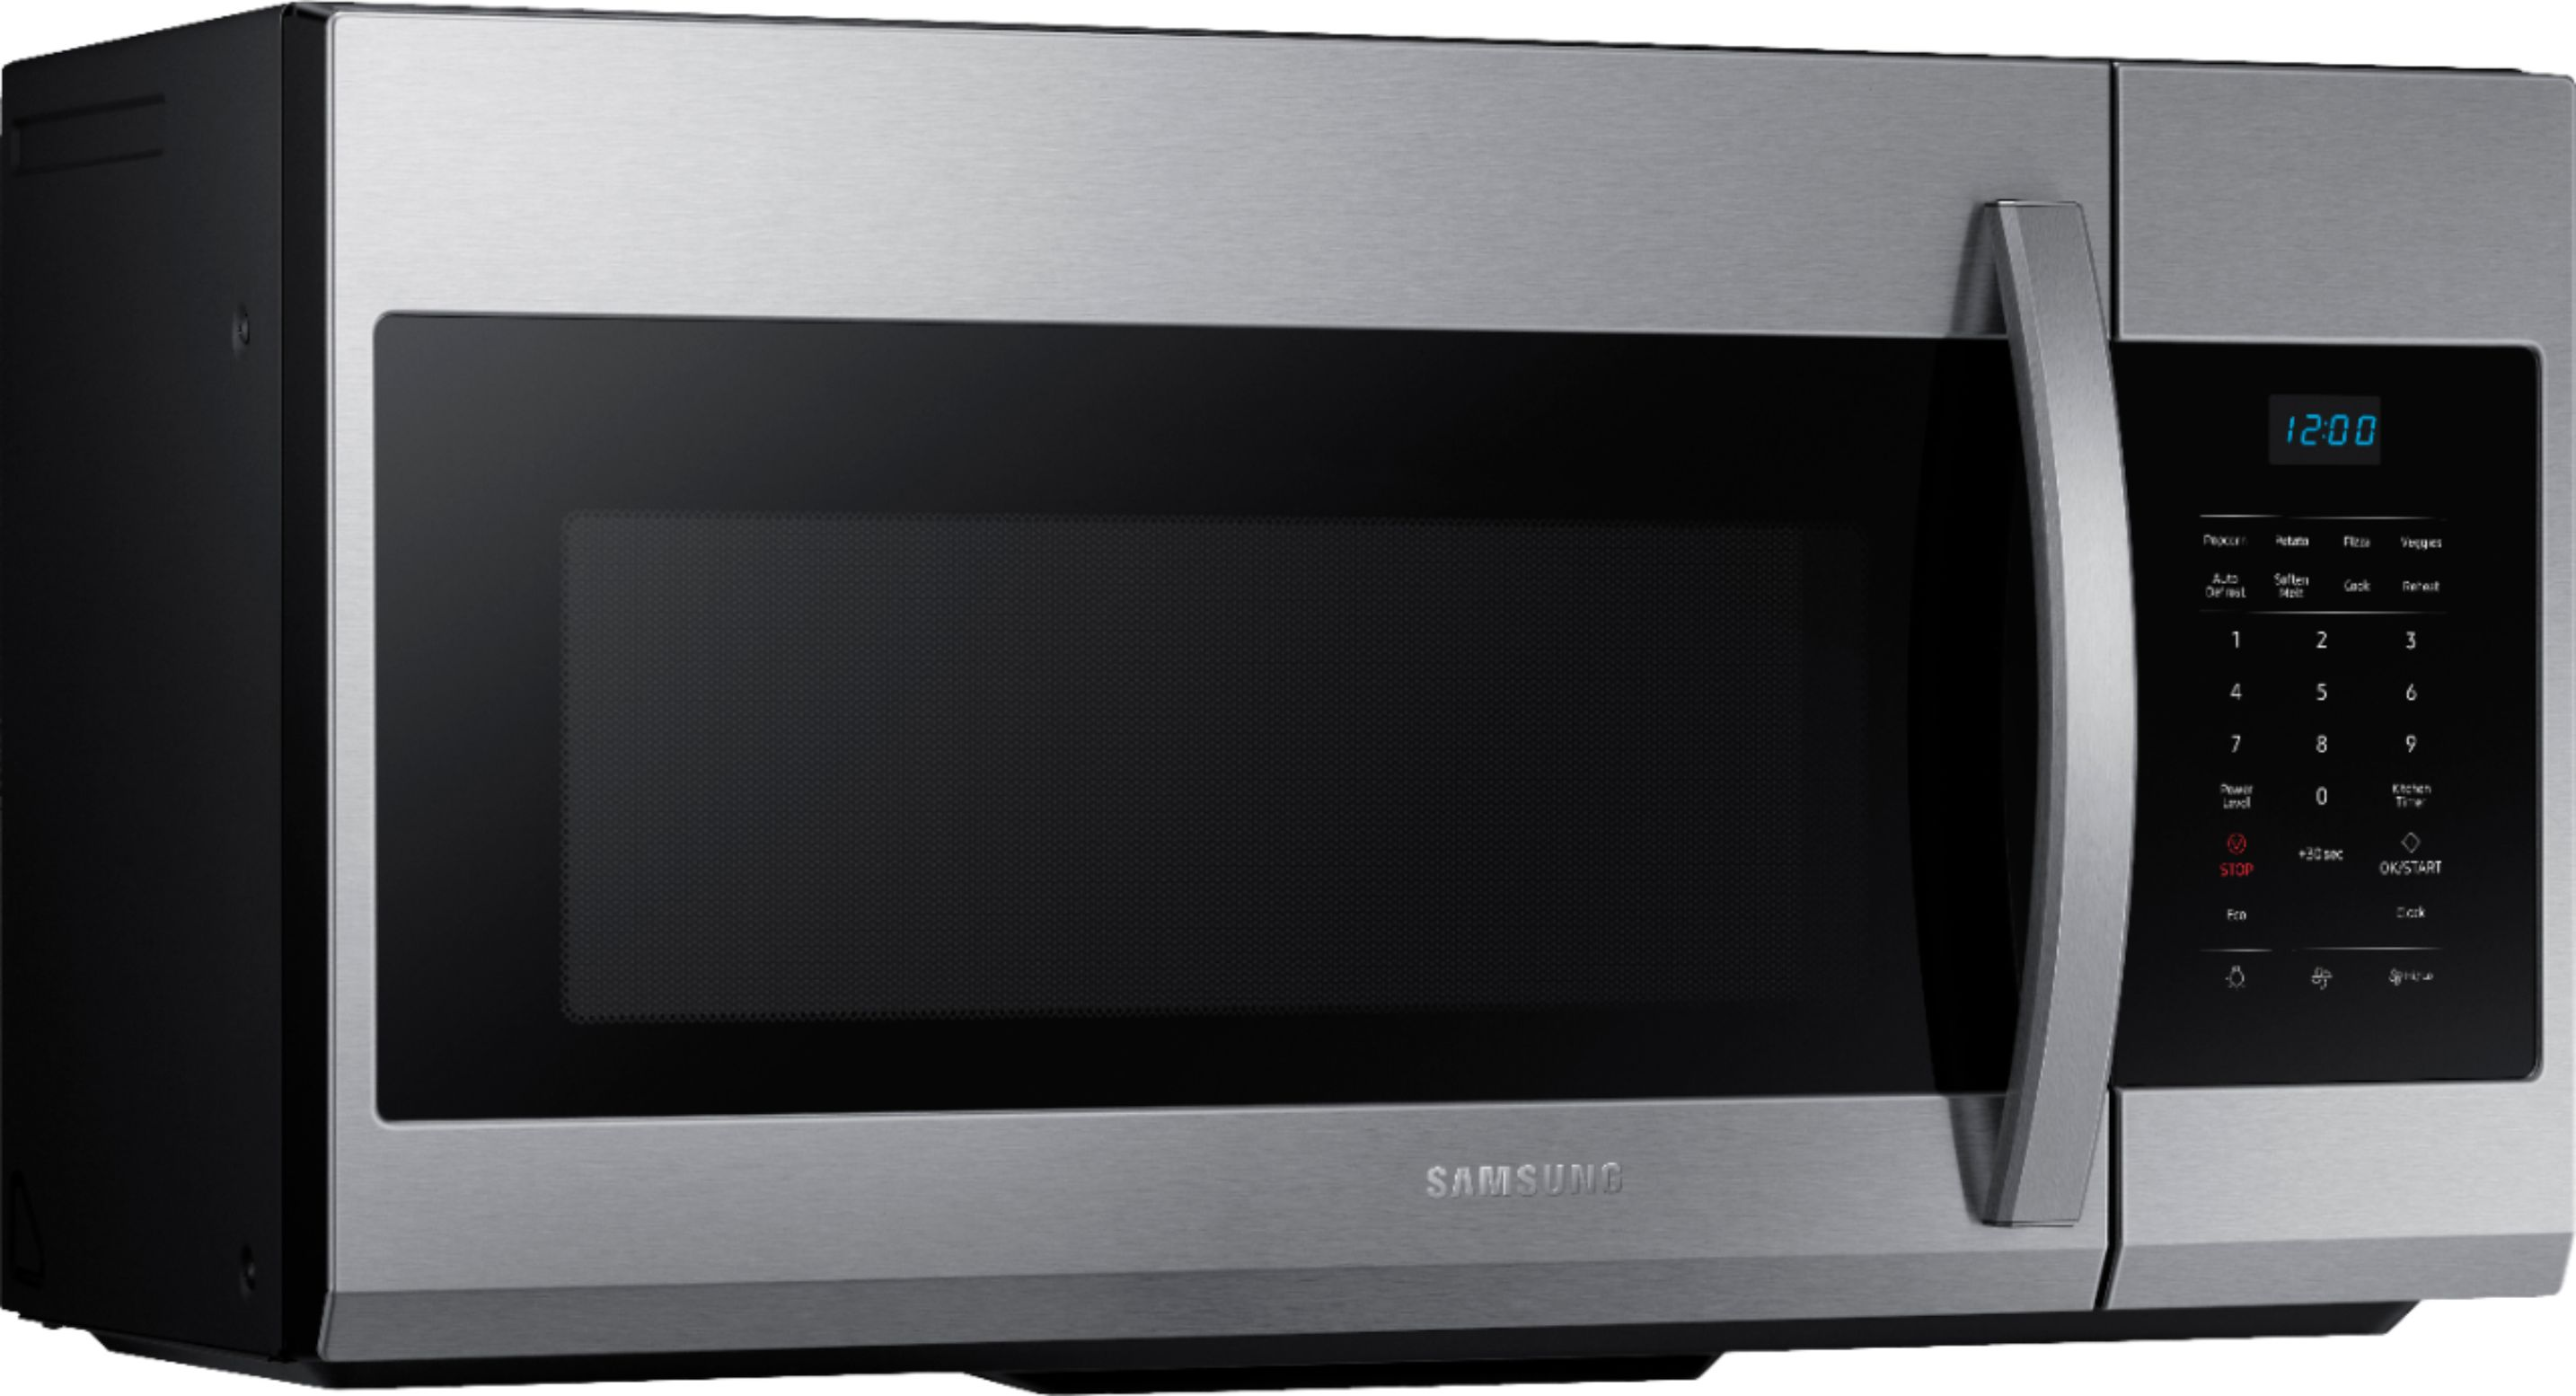 samsung 1 7 cu ft over the range microwave fingerprint resistant stainless steel